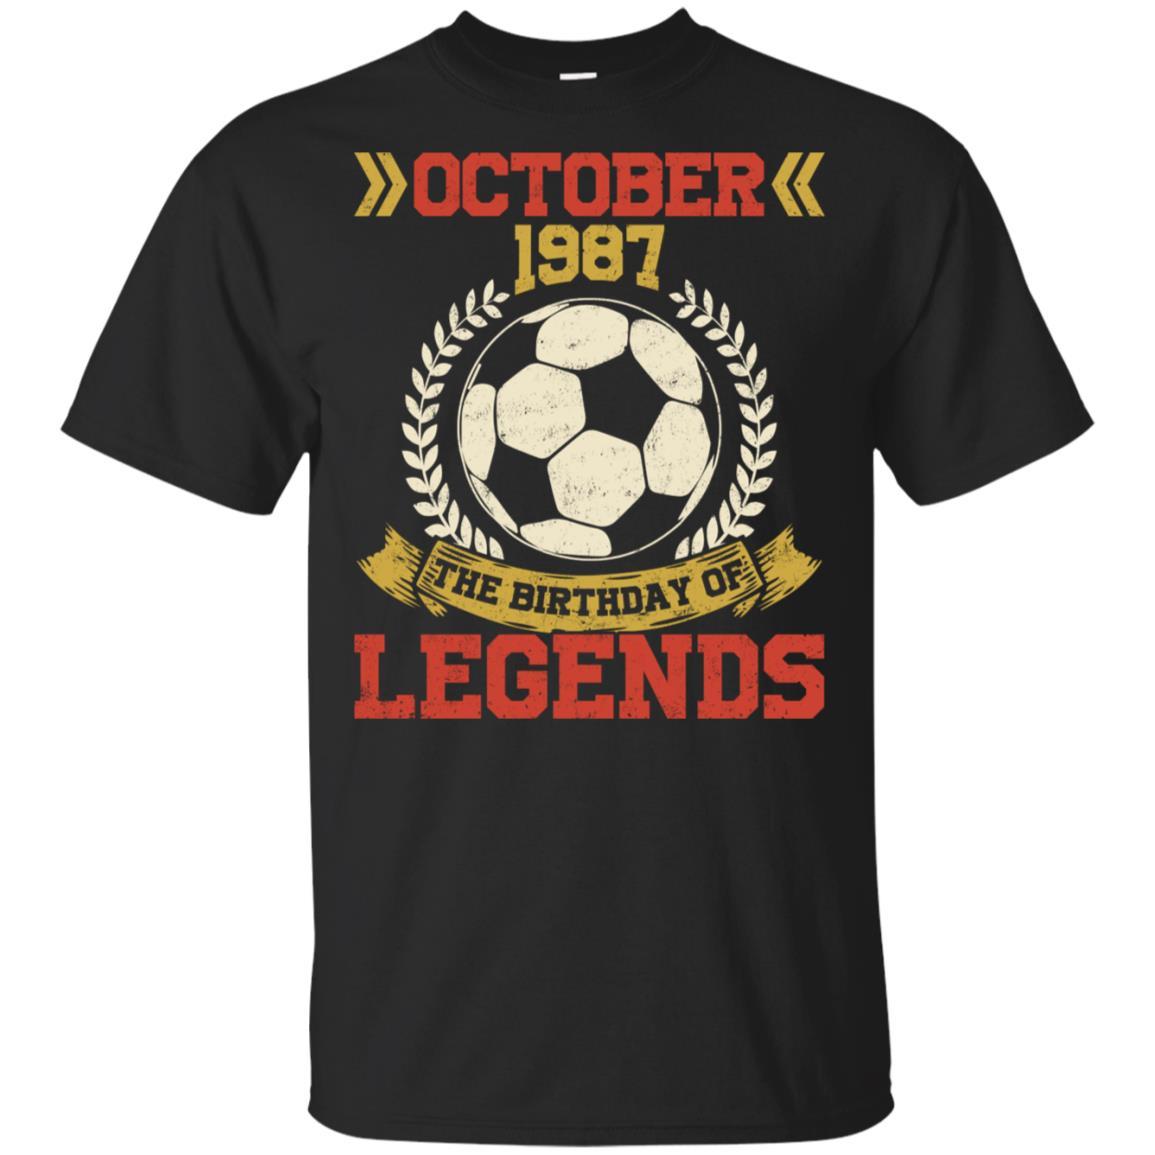 1987 October 31st Birthday Of Football Soccer Legend Unisex Short Sleeve